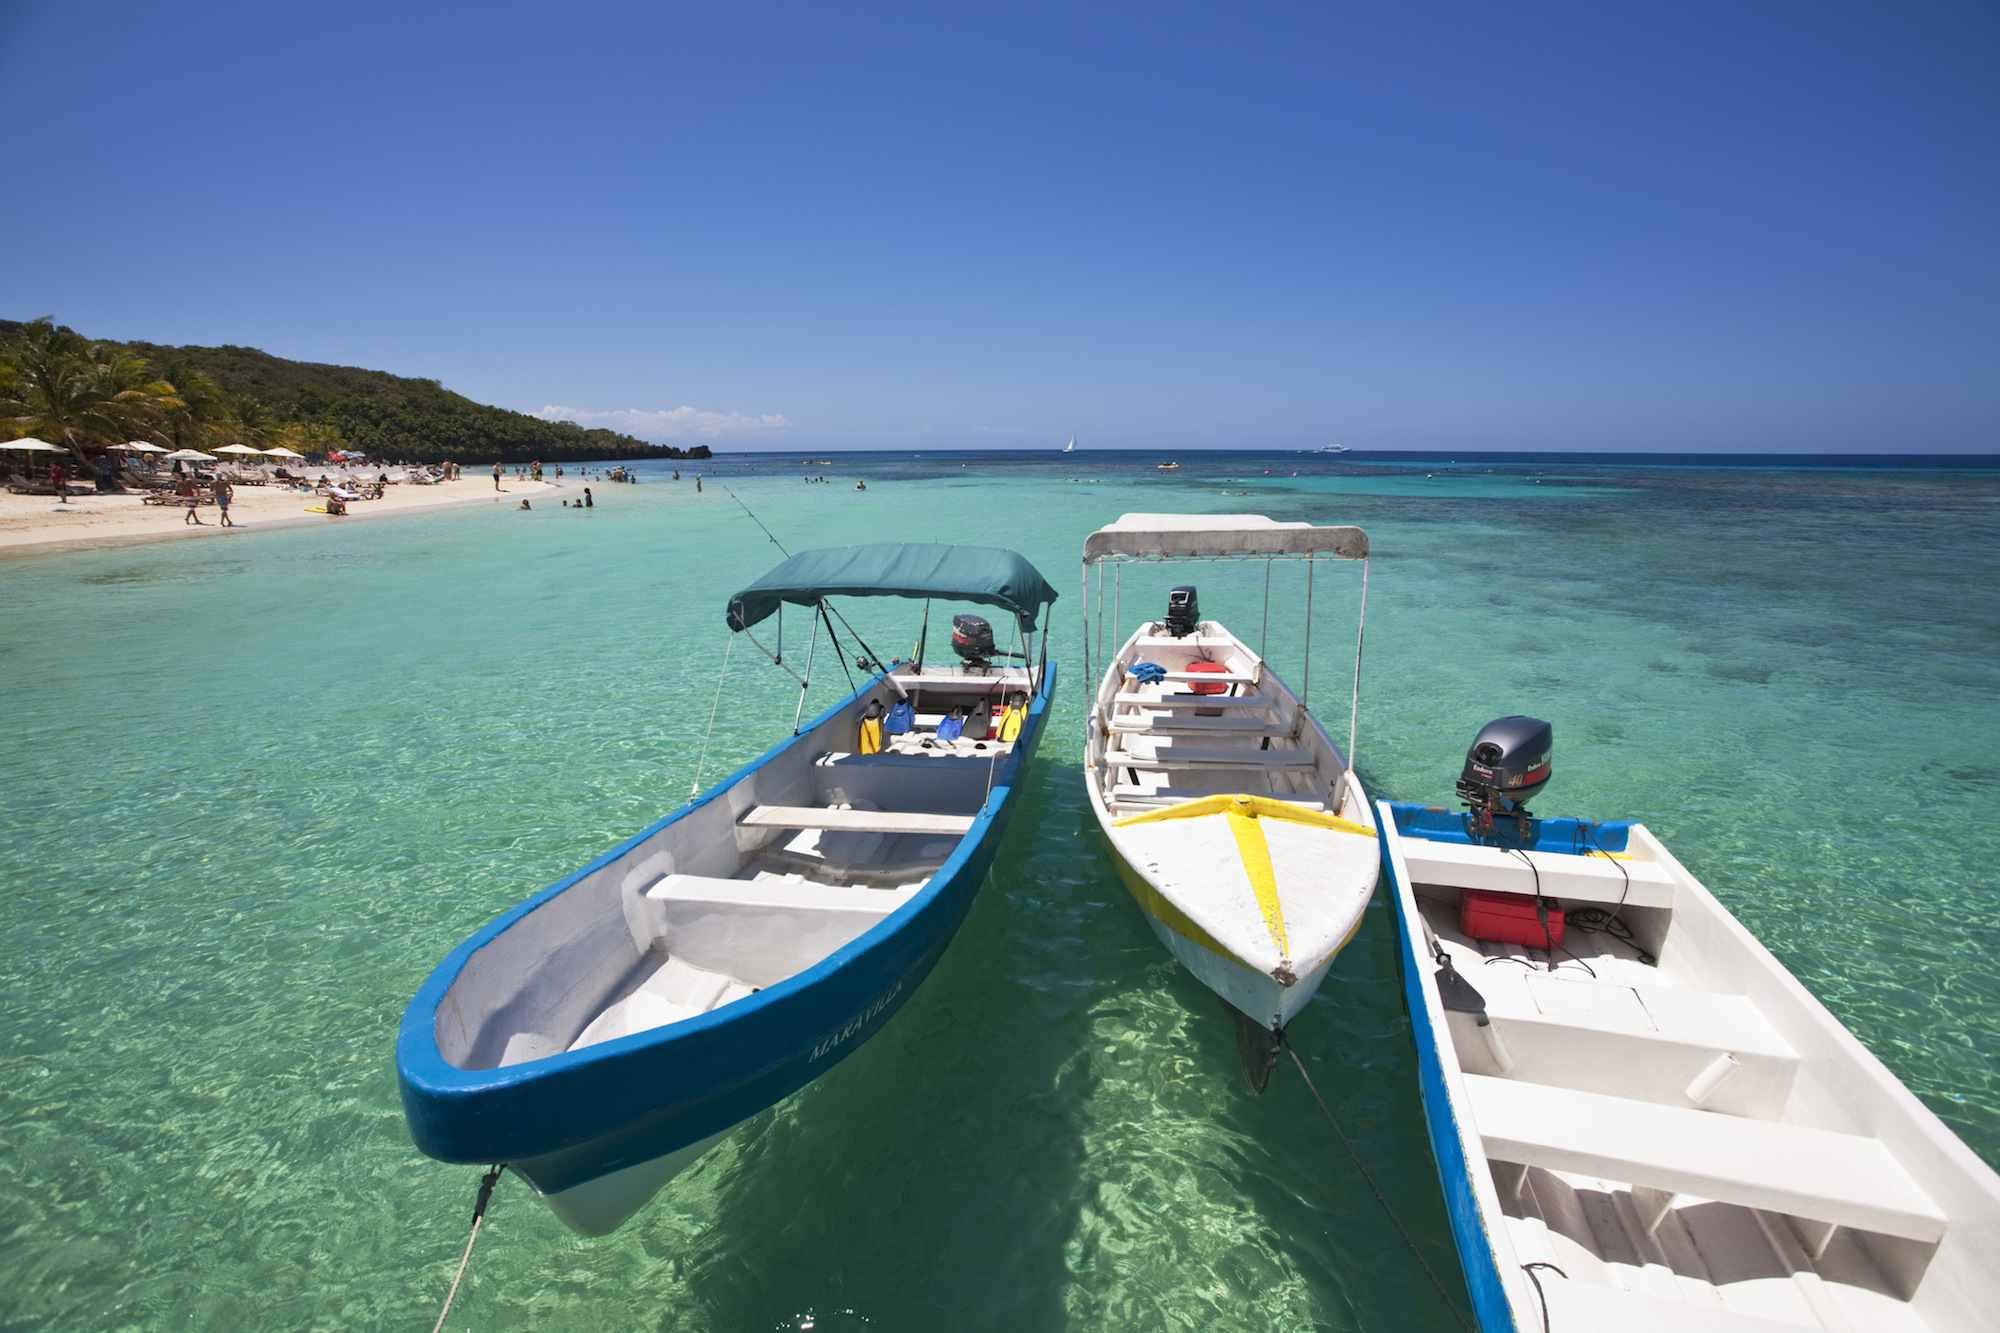 Honduras, Bay Islands, Roatan, West Bay, Boats